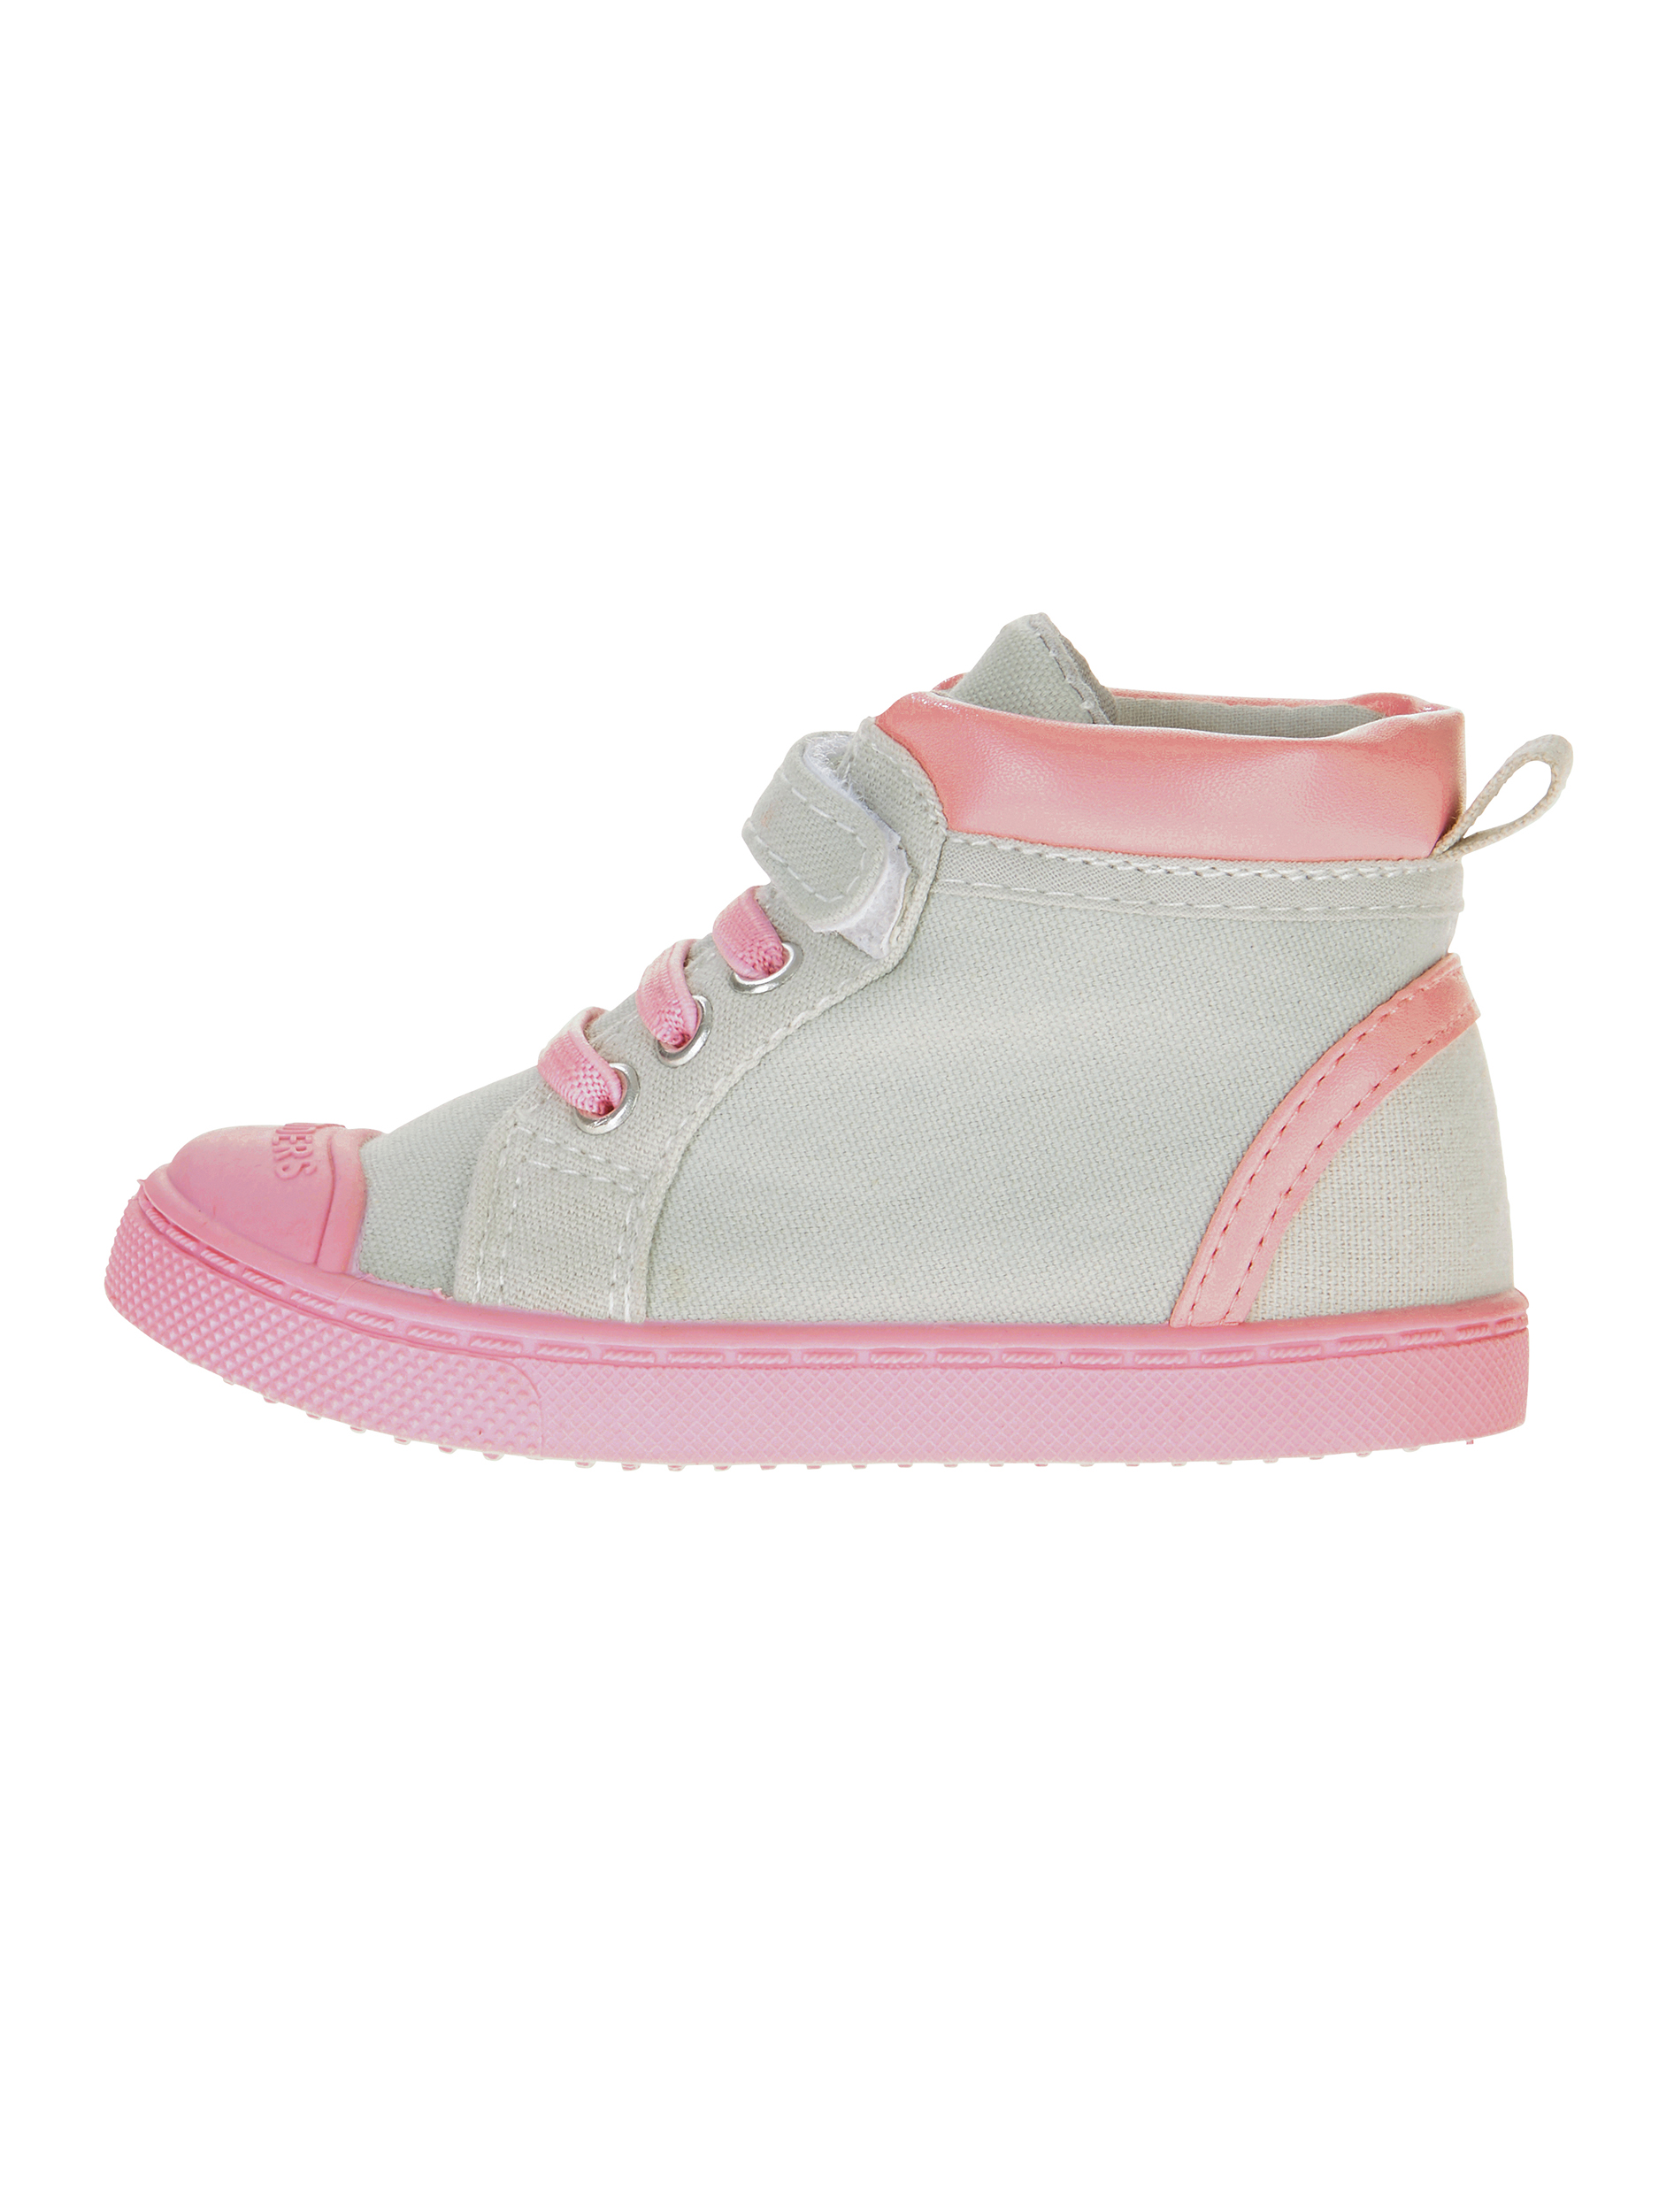 Skidders Baby Girls' Multi Closure High Top Casual Shoe